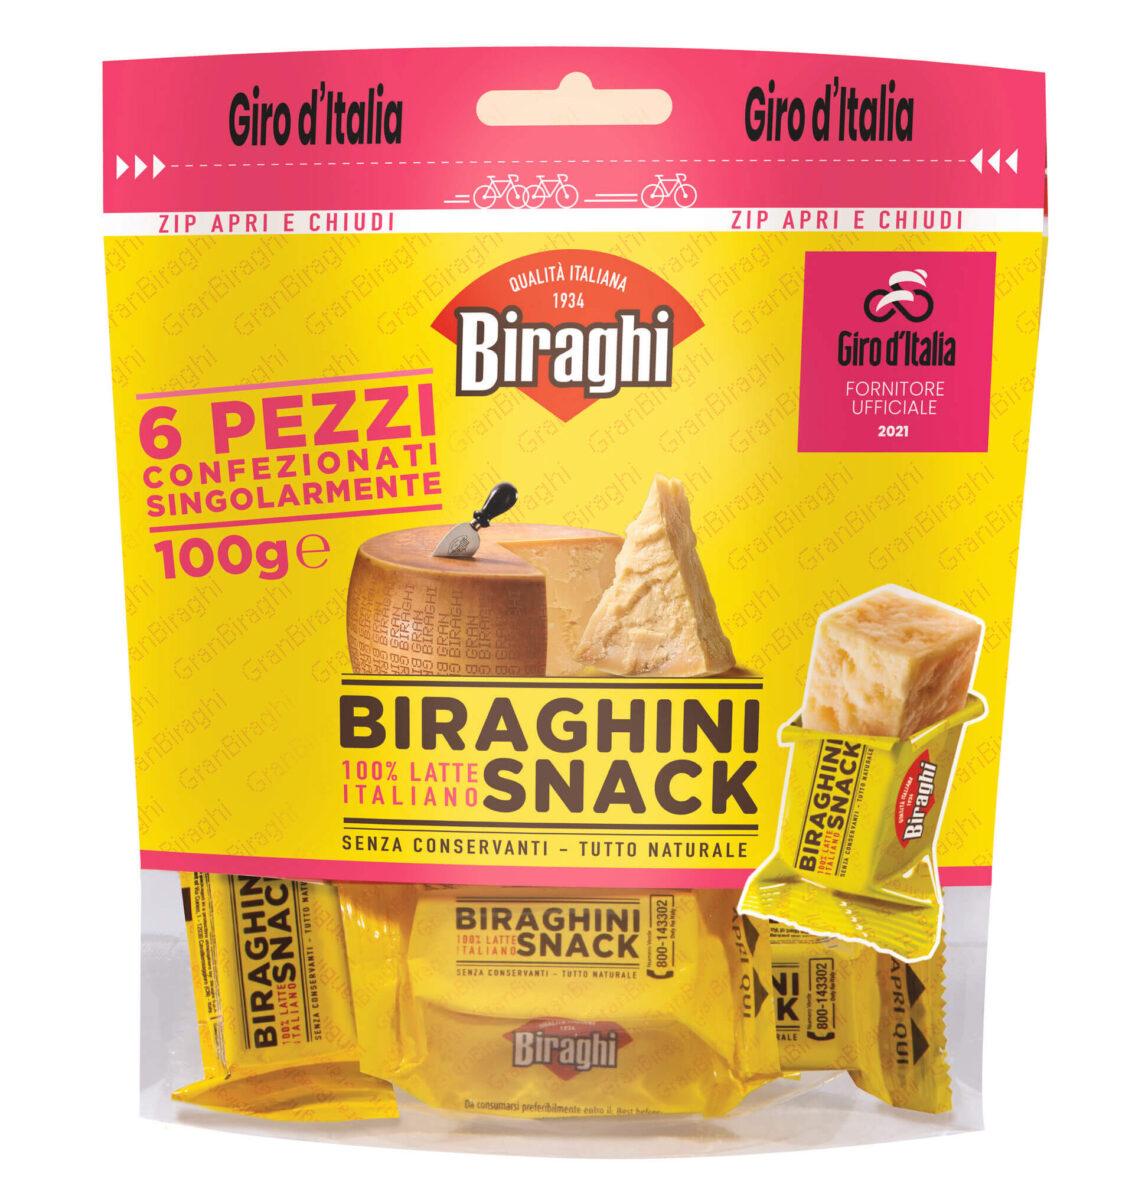 Biraghini Snack